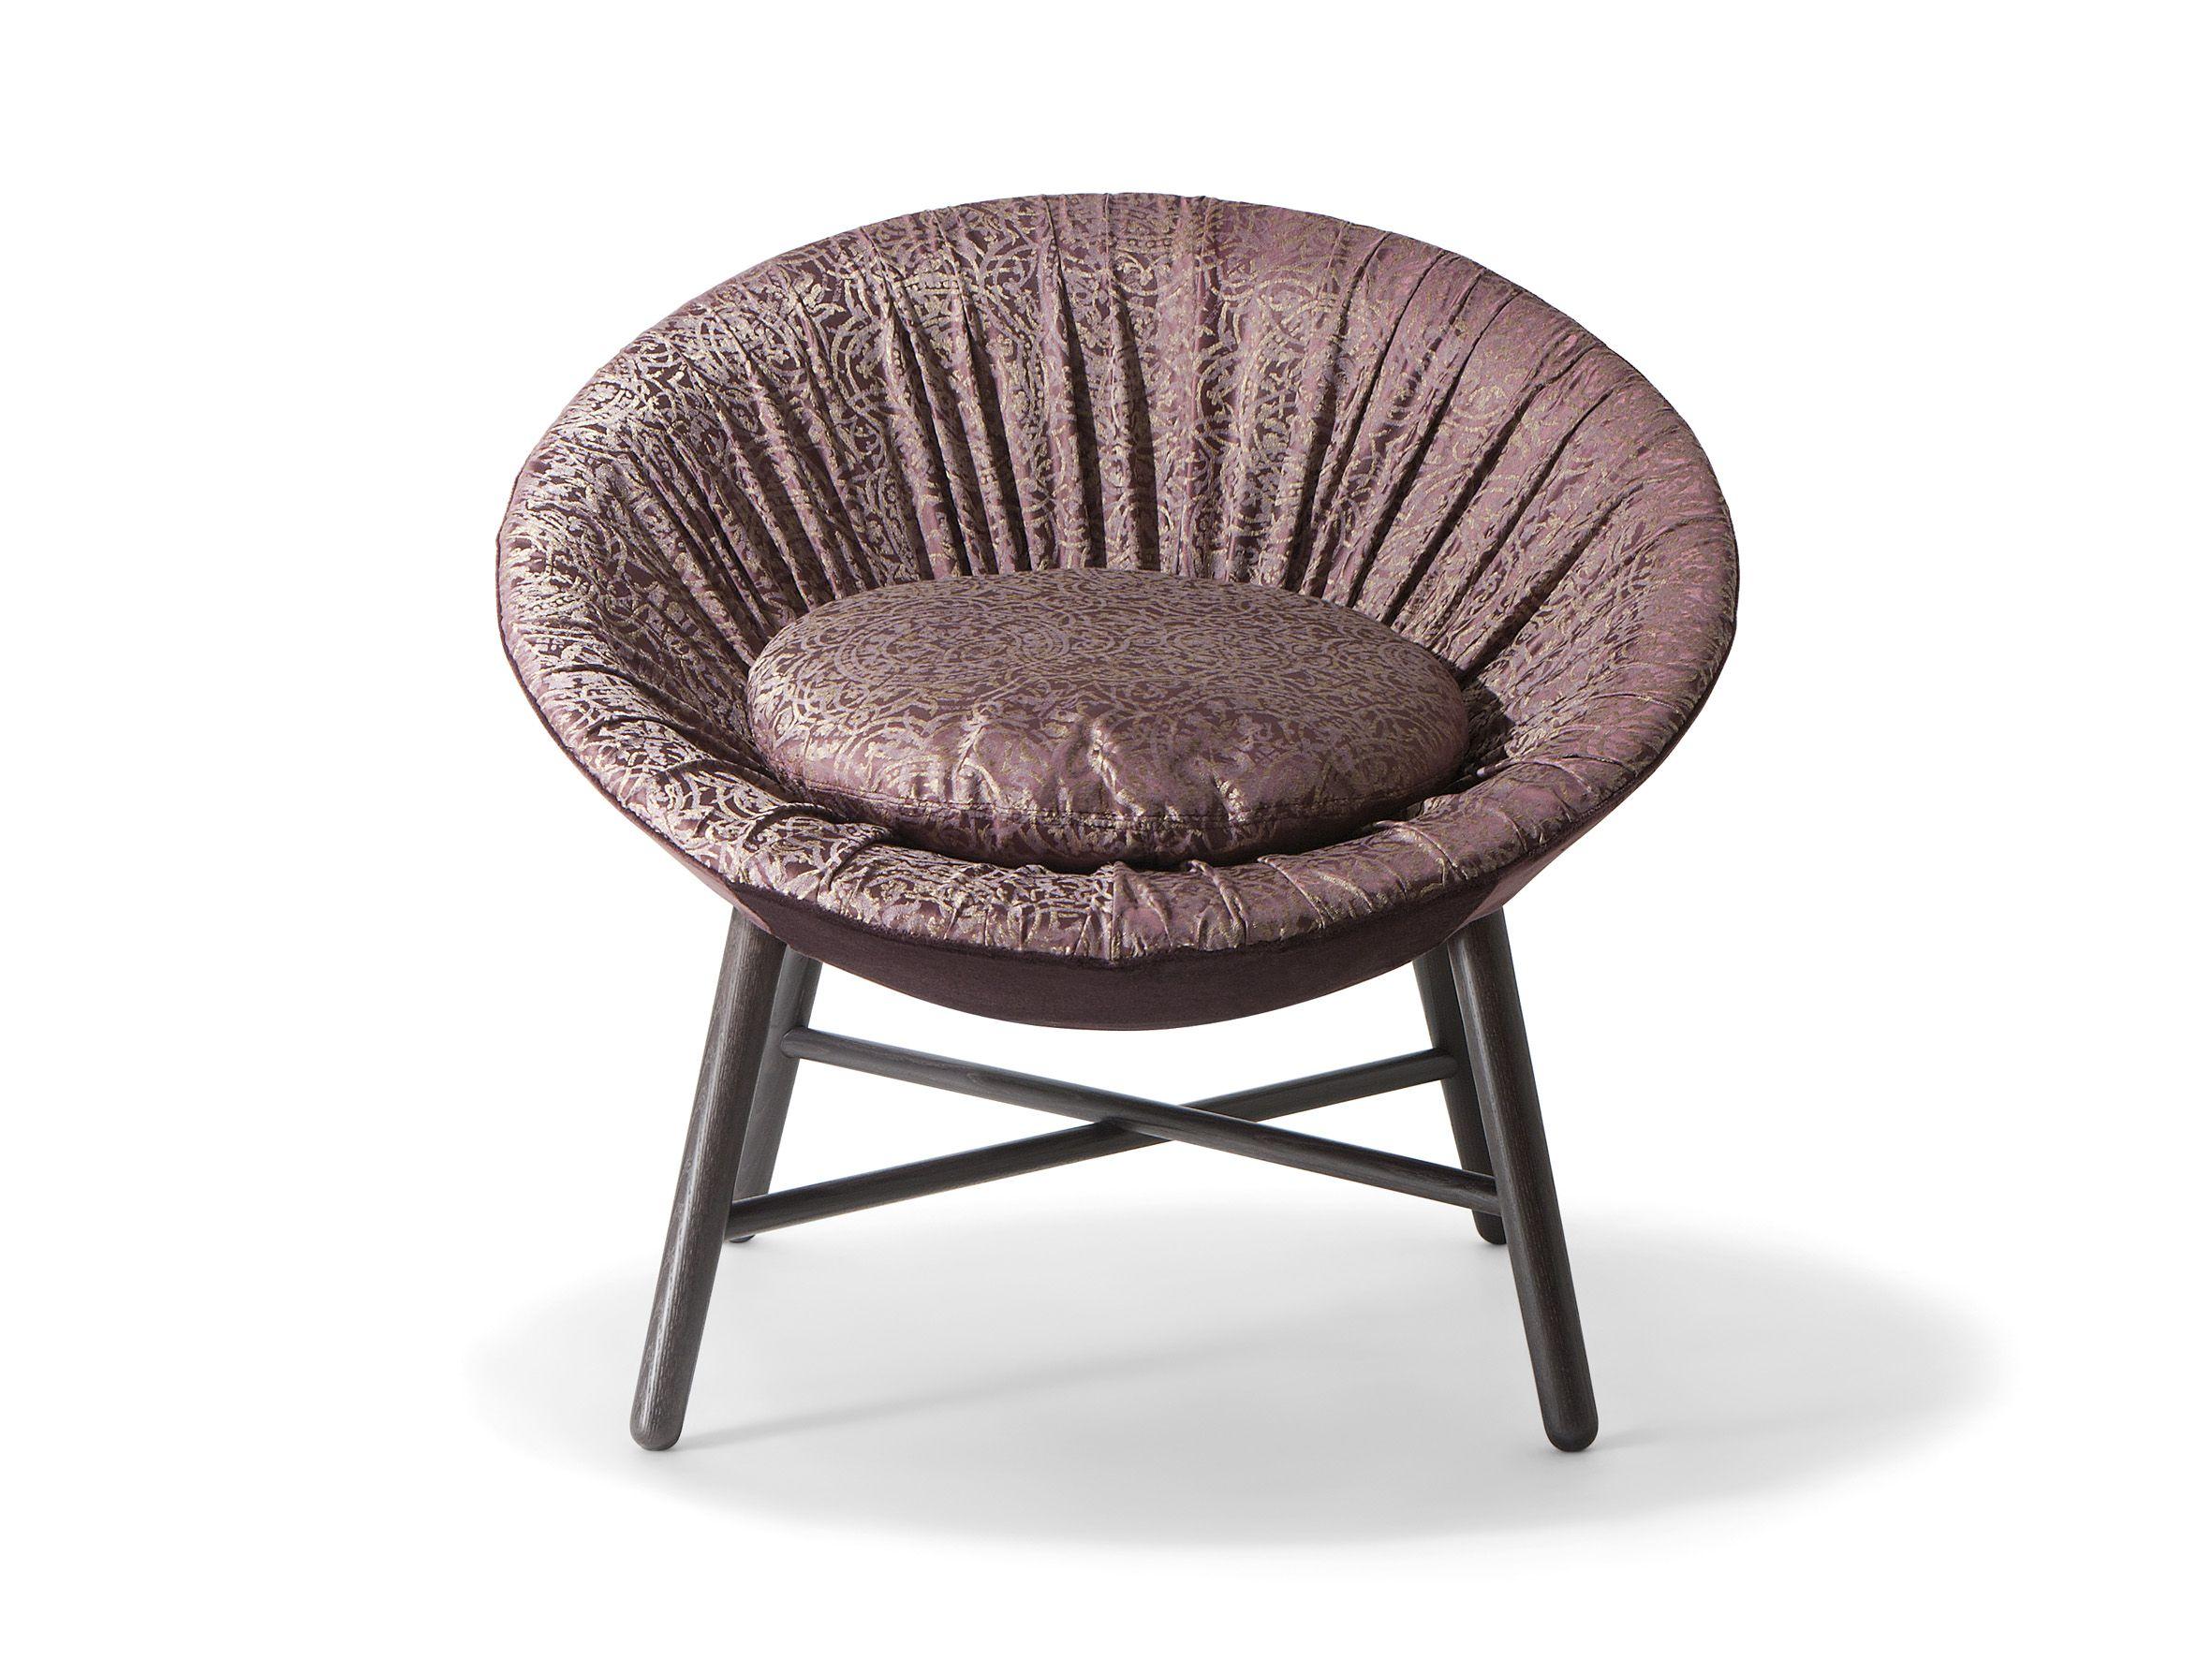 Cizeta Sedie ~ Surf #chair #oak @cizetasedie #design edi & paolo ciani